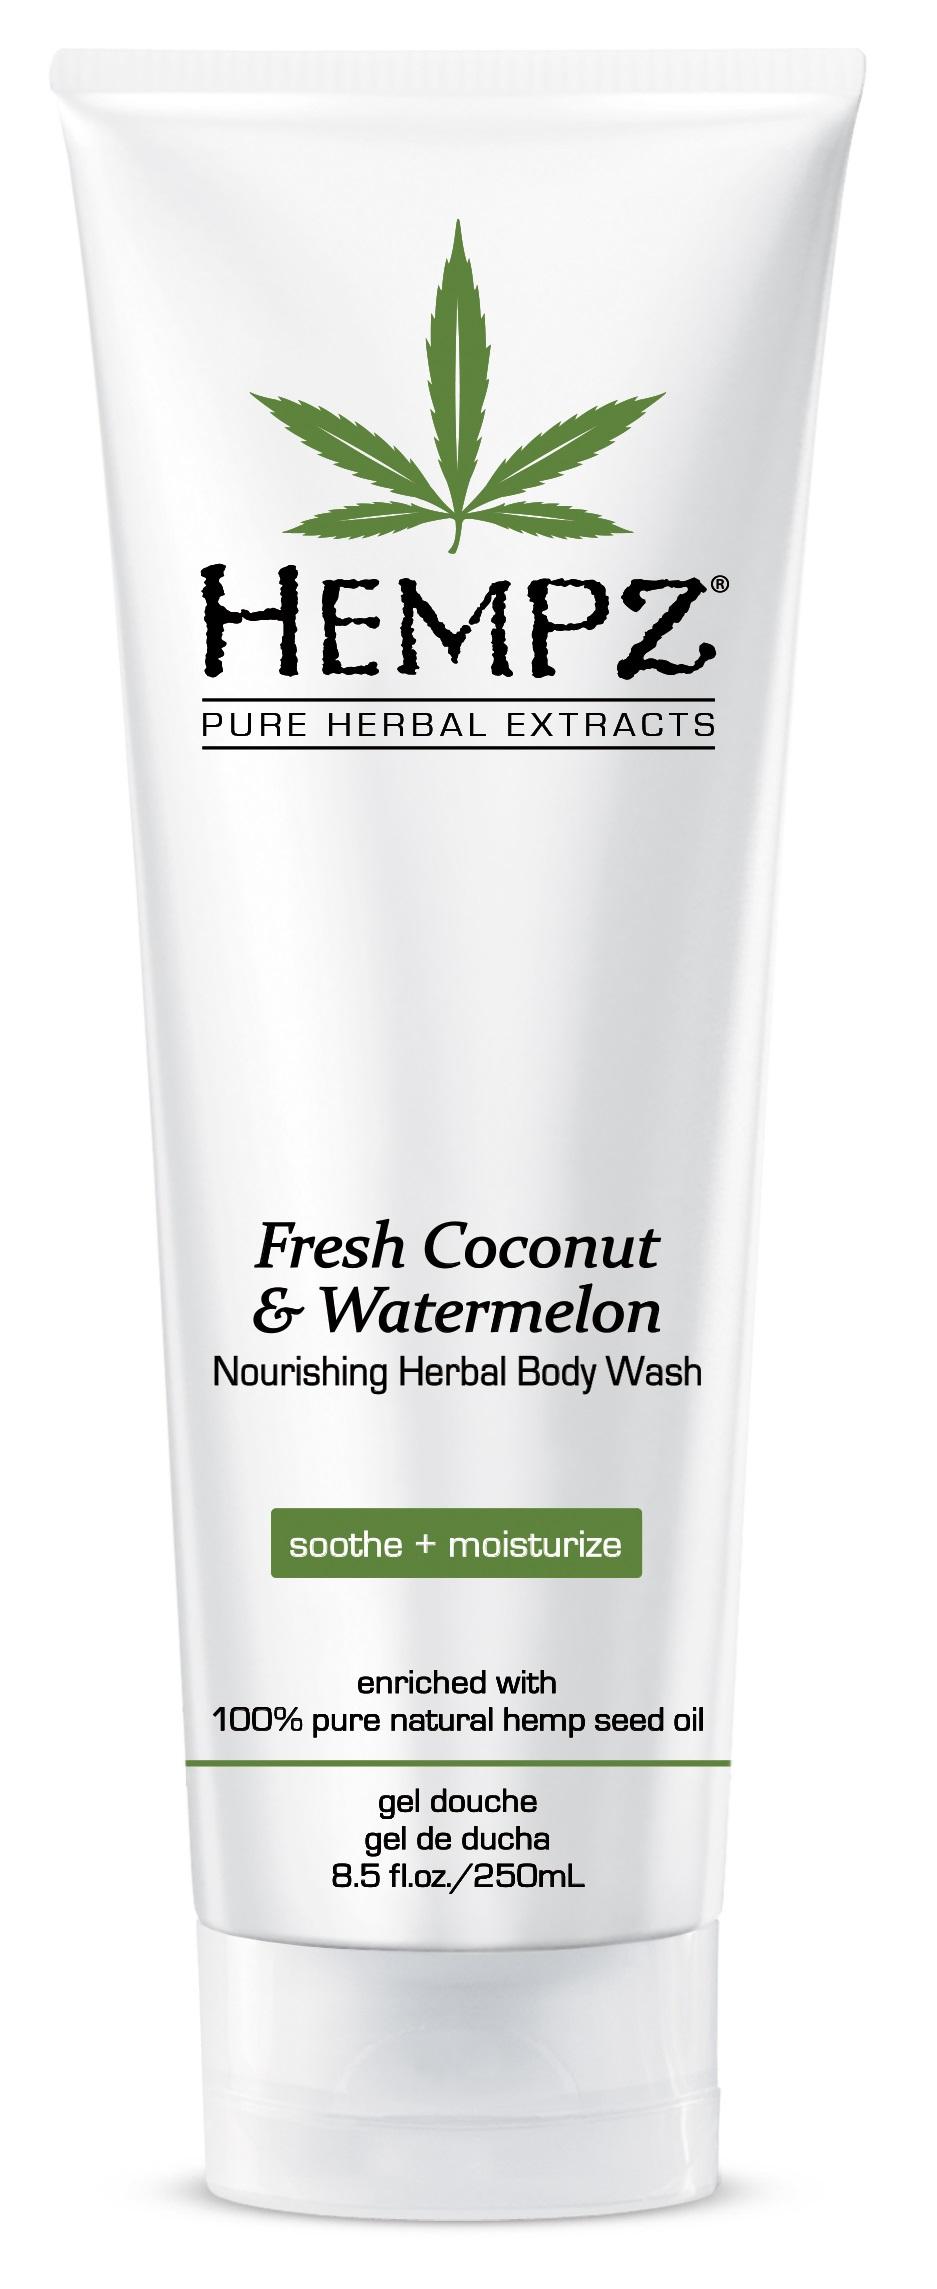 Image of Hempz Fresh Coconut & Watermelon Nourishing Herbal Body Wash